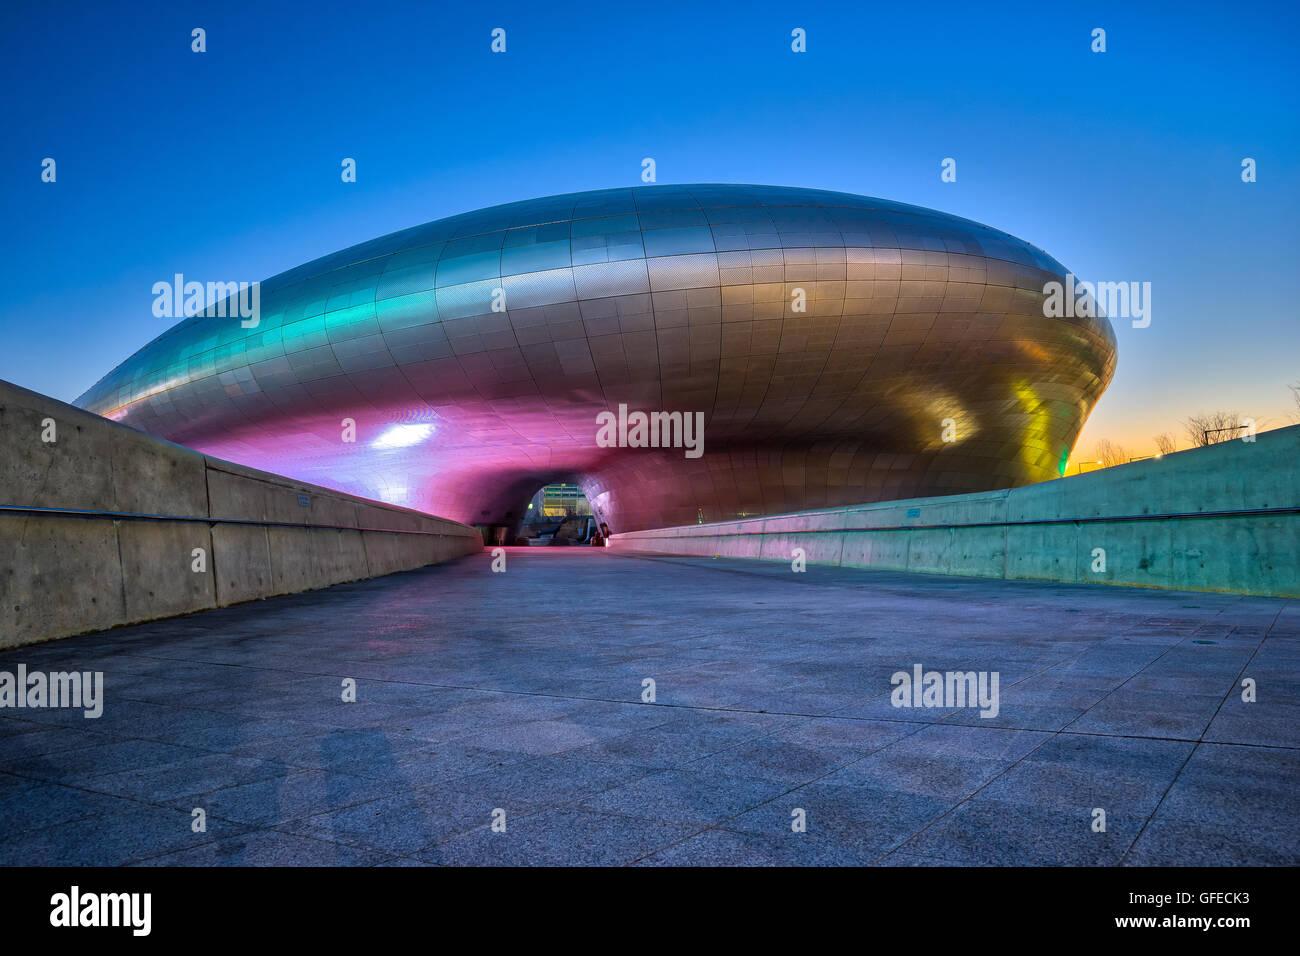 Seoul, South Korea- December 7, 2015: The Dongdaemun Design Plaza, also called the DDP, is a major urban development - Stock Image